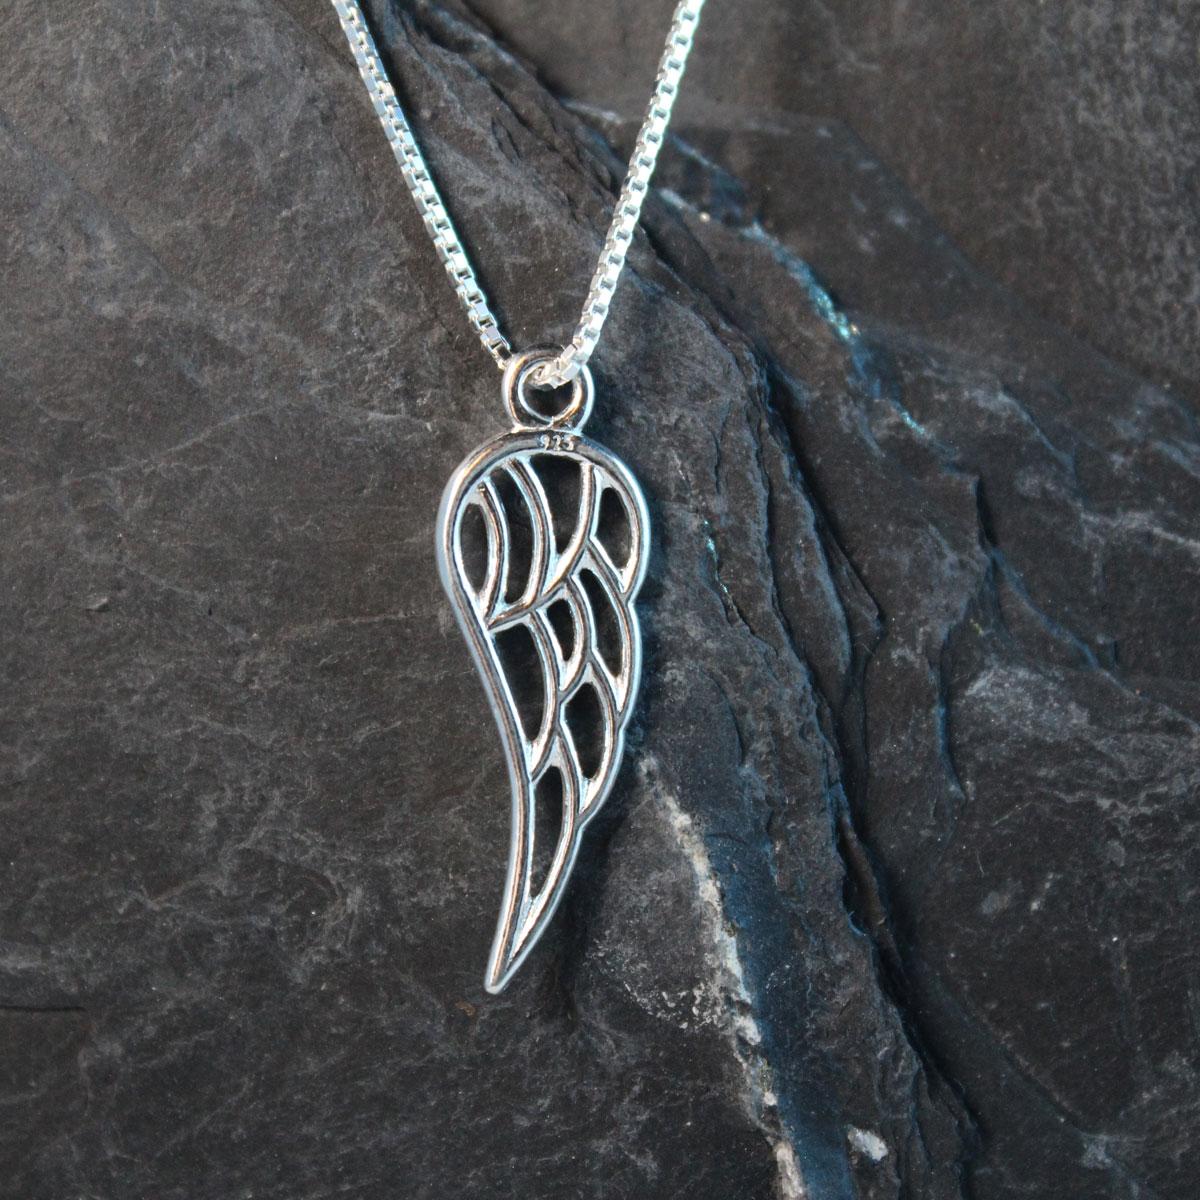 Schmuckextra Flügel Silber